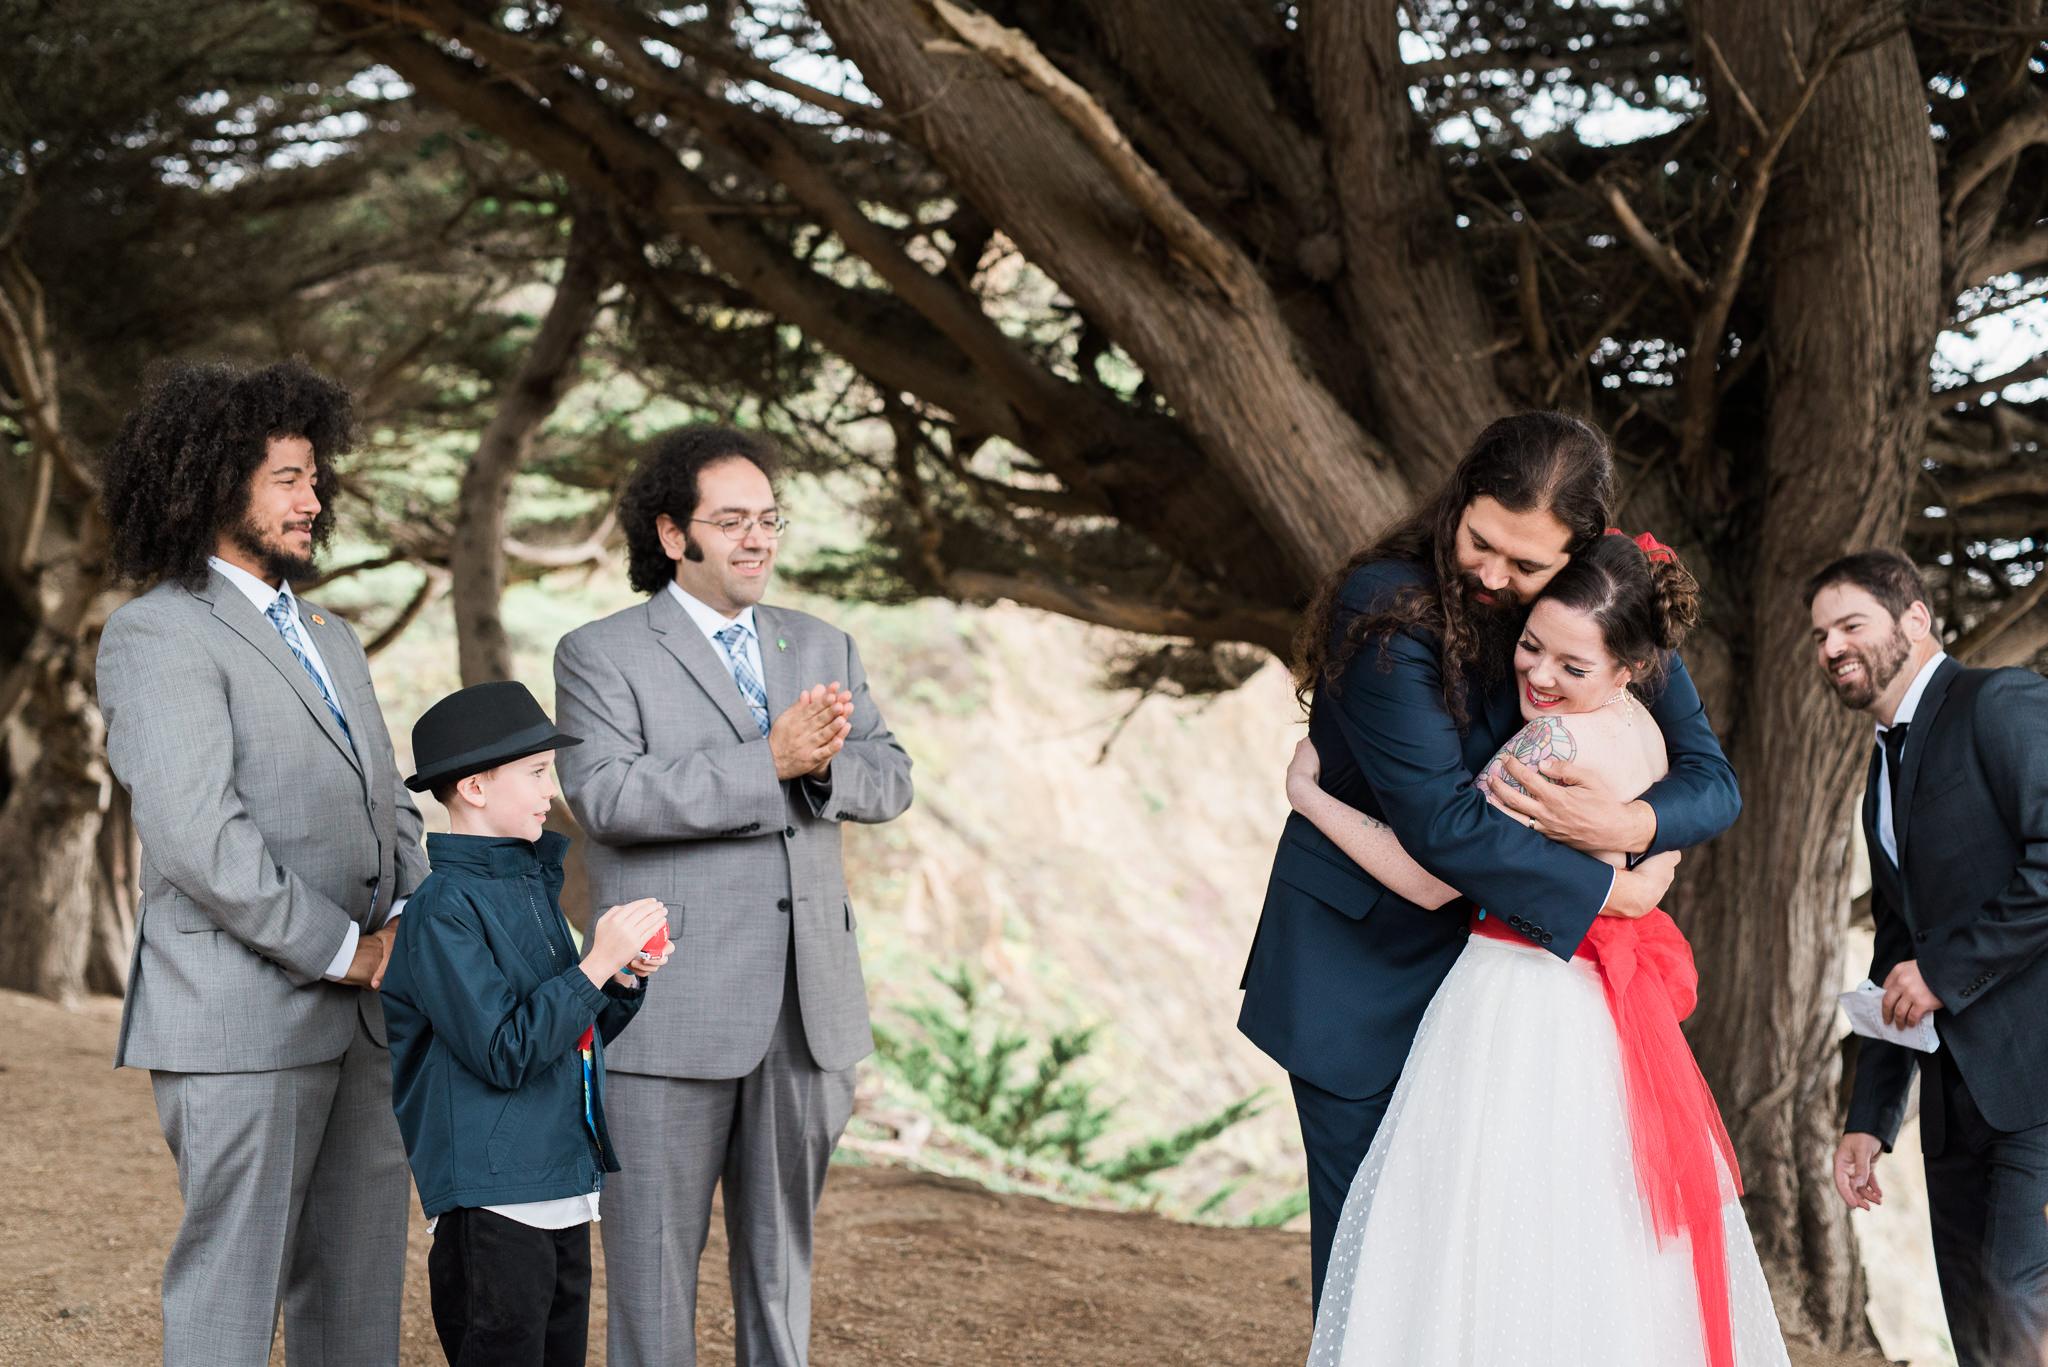 Gray Whale Cove Wedding 012.jpg